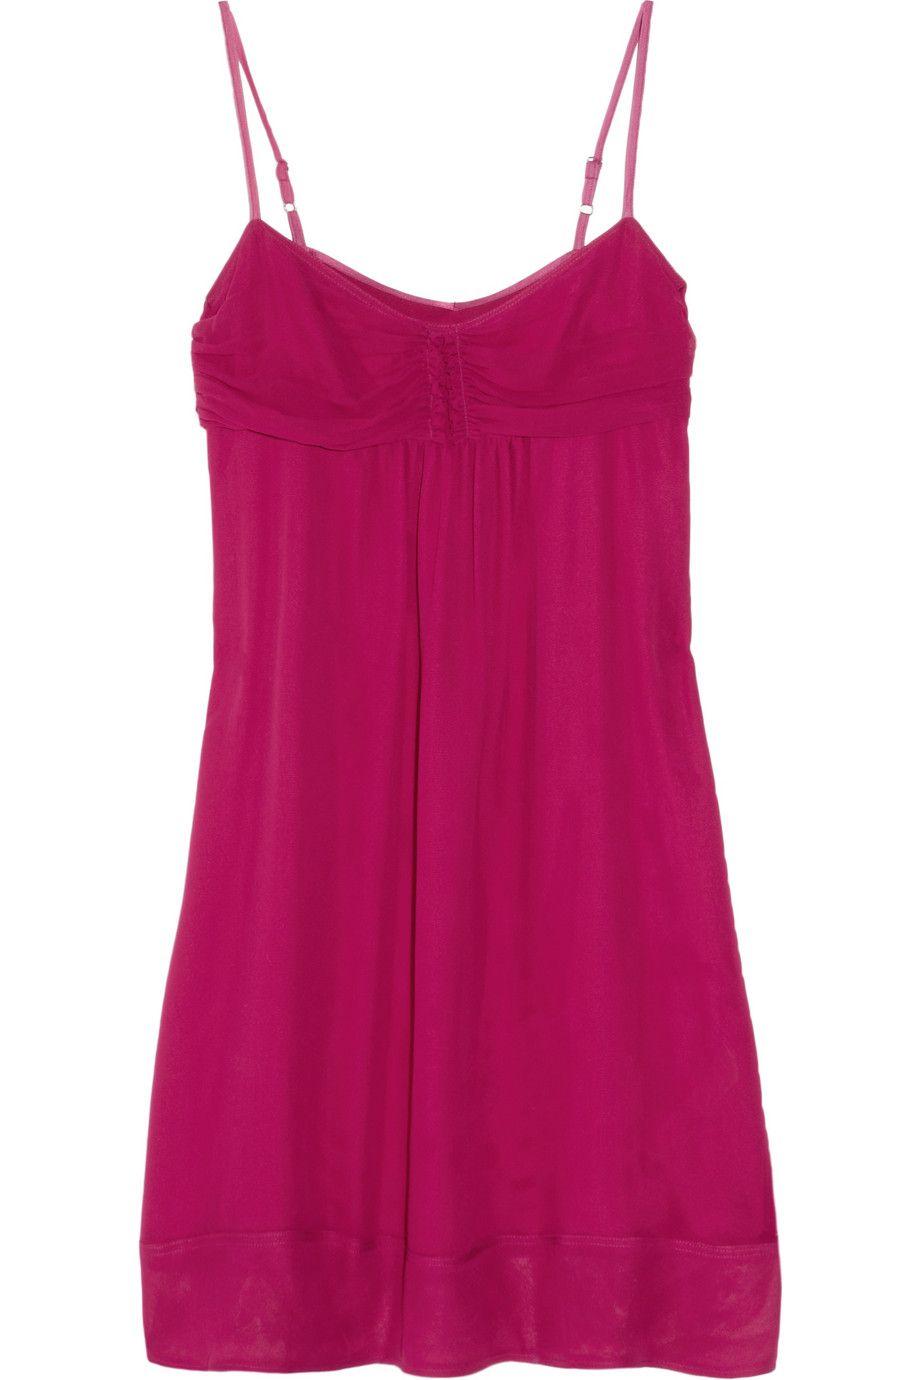 Burberry Brit  Silk-georgette chemise  $425